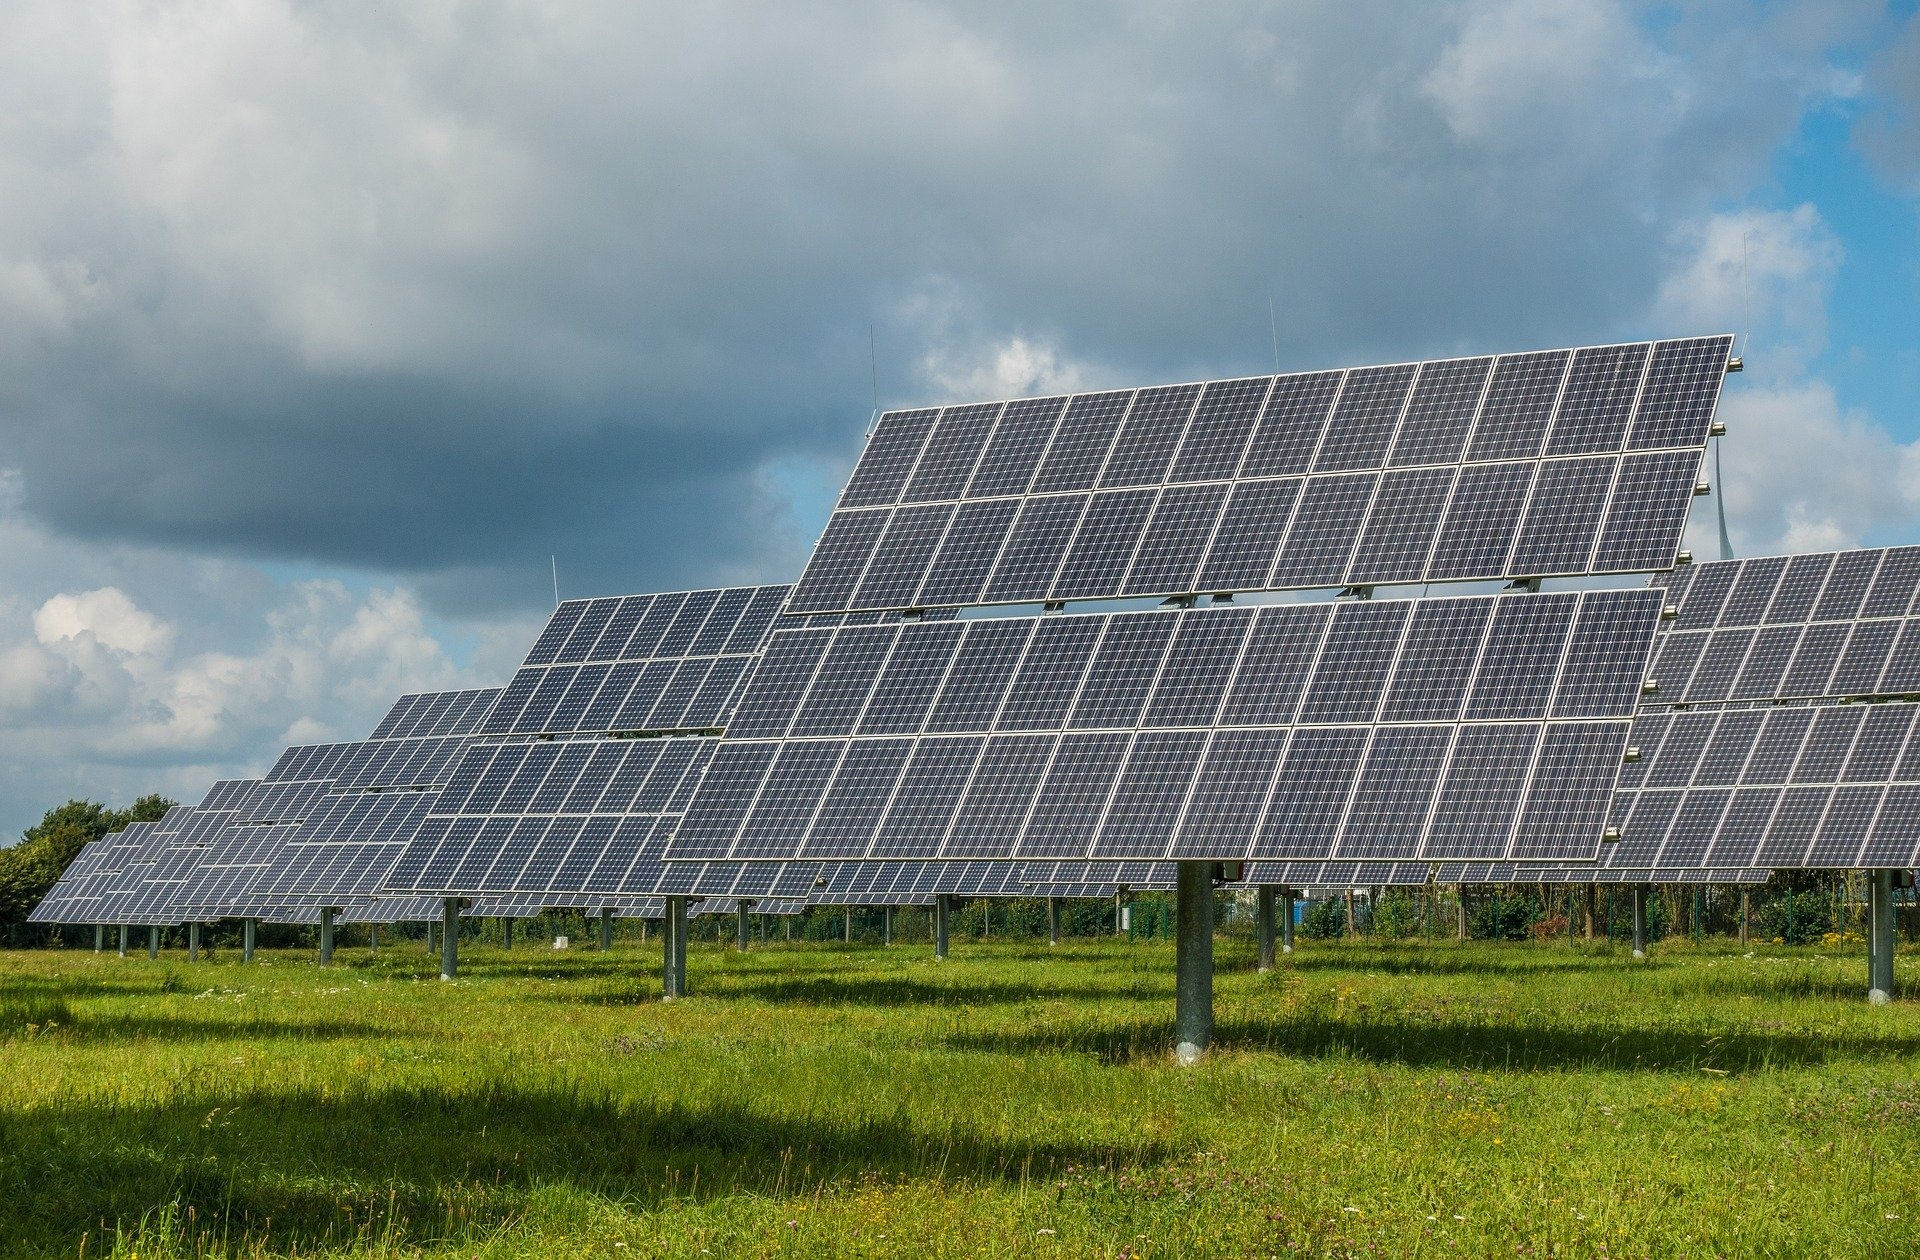 Solar Farm, Solar Land Lease, Landowners, Arkansas, YSG Solar